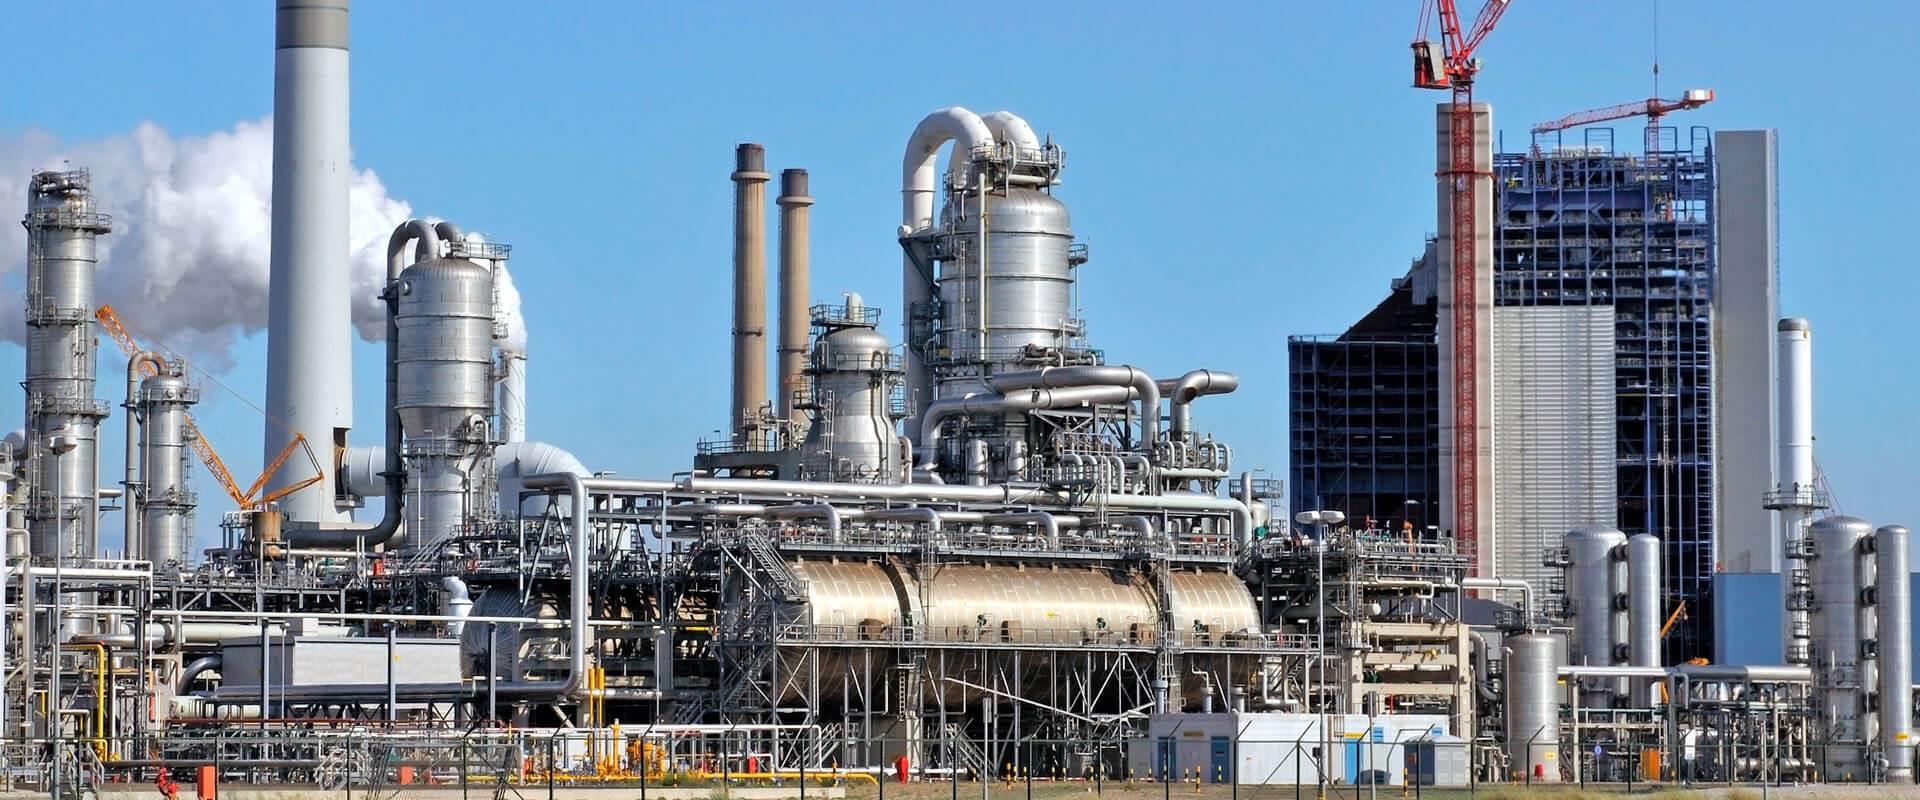 Refineries & Pipelines Drinking Water & Waste Water & High Flow Oil Self Clean Filter